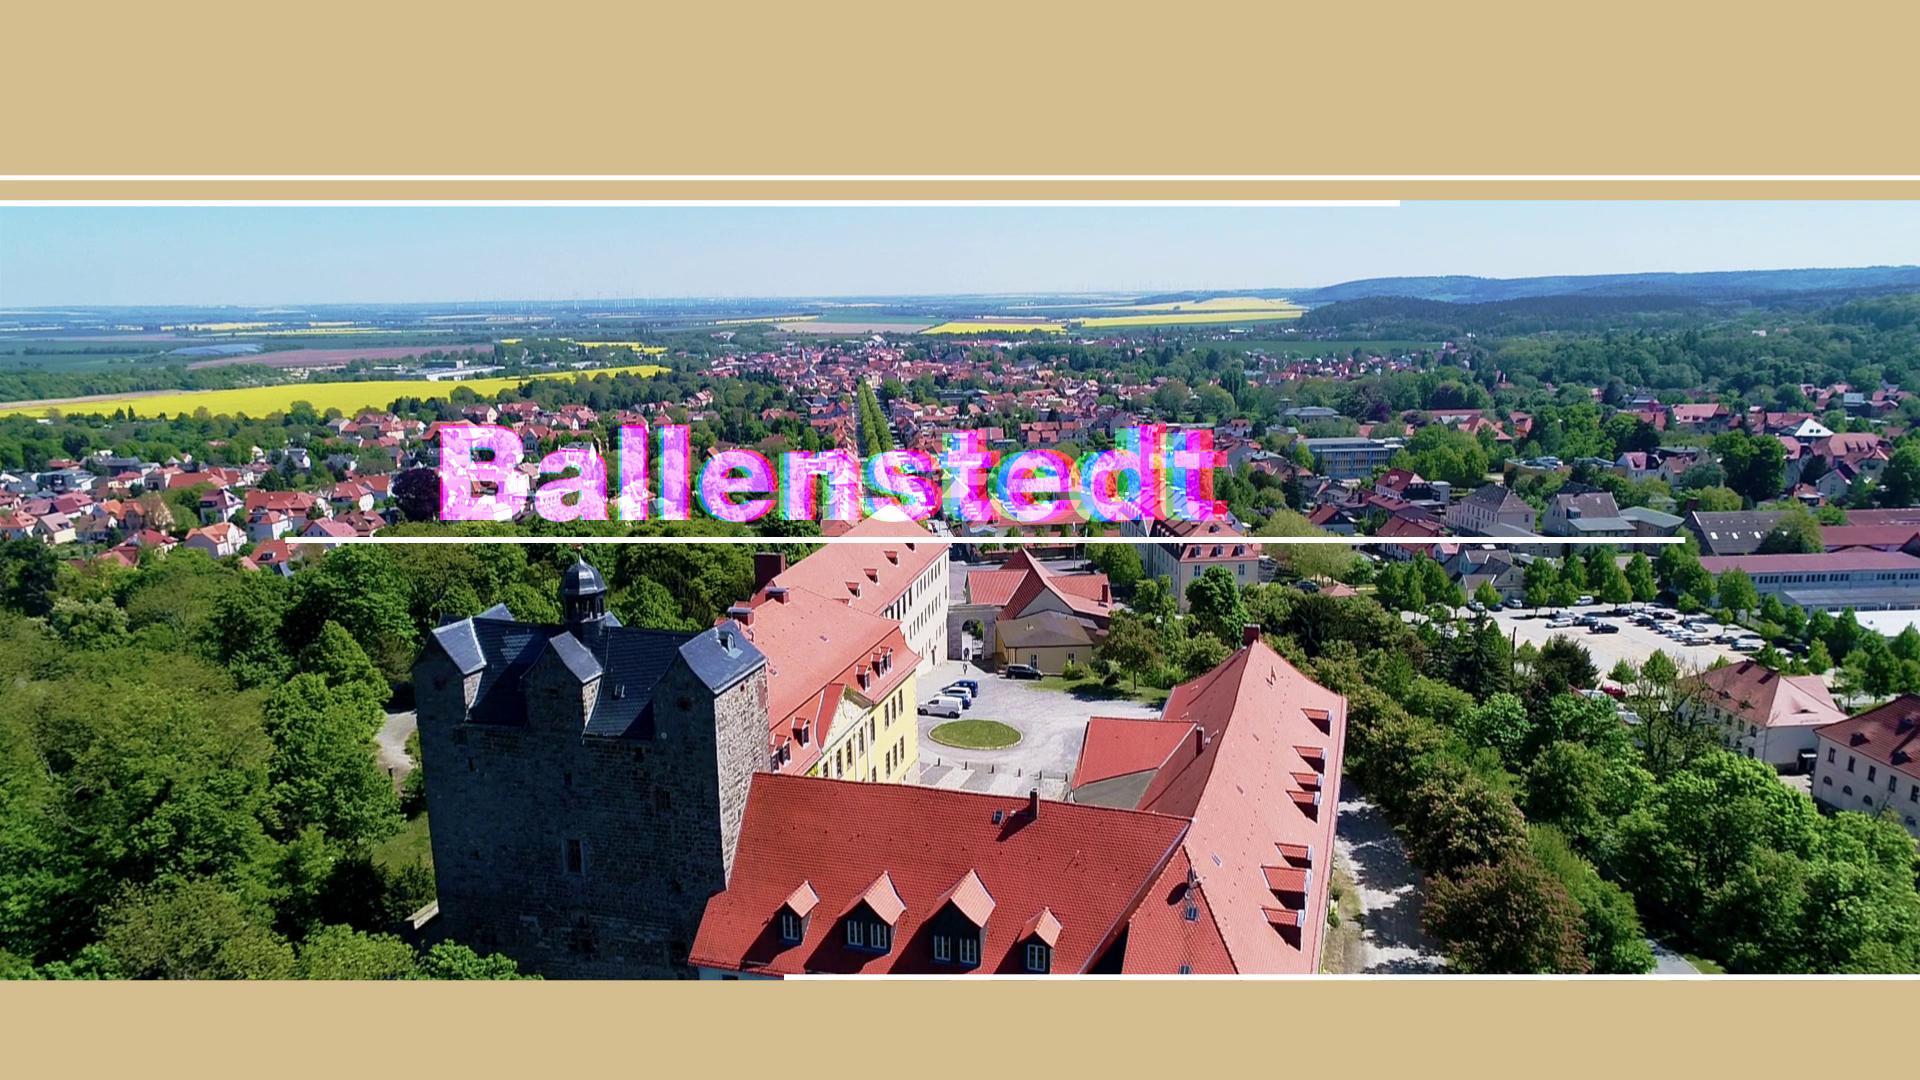 Imagefilm Ballenstedt 2018 / © Stadt Ballenstedt / Martin Kreyßig